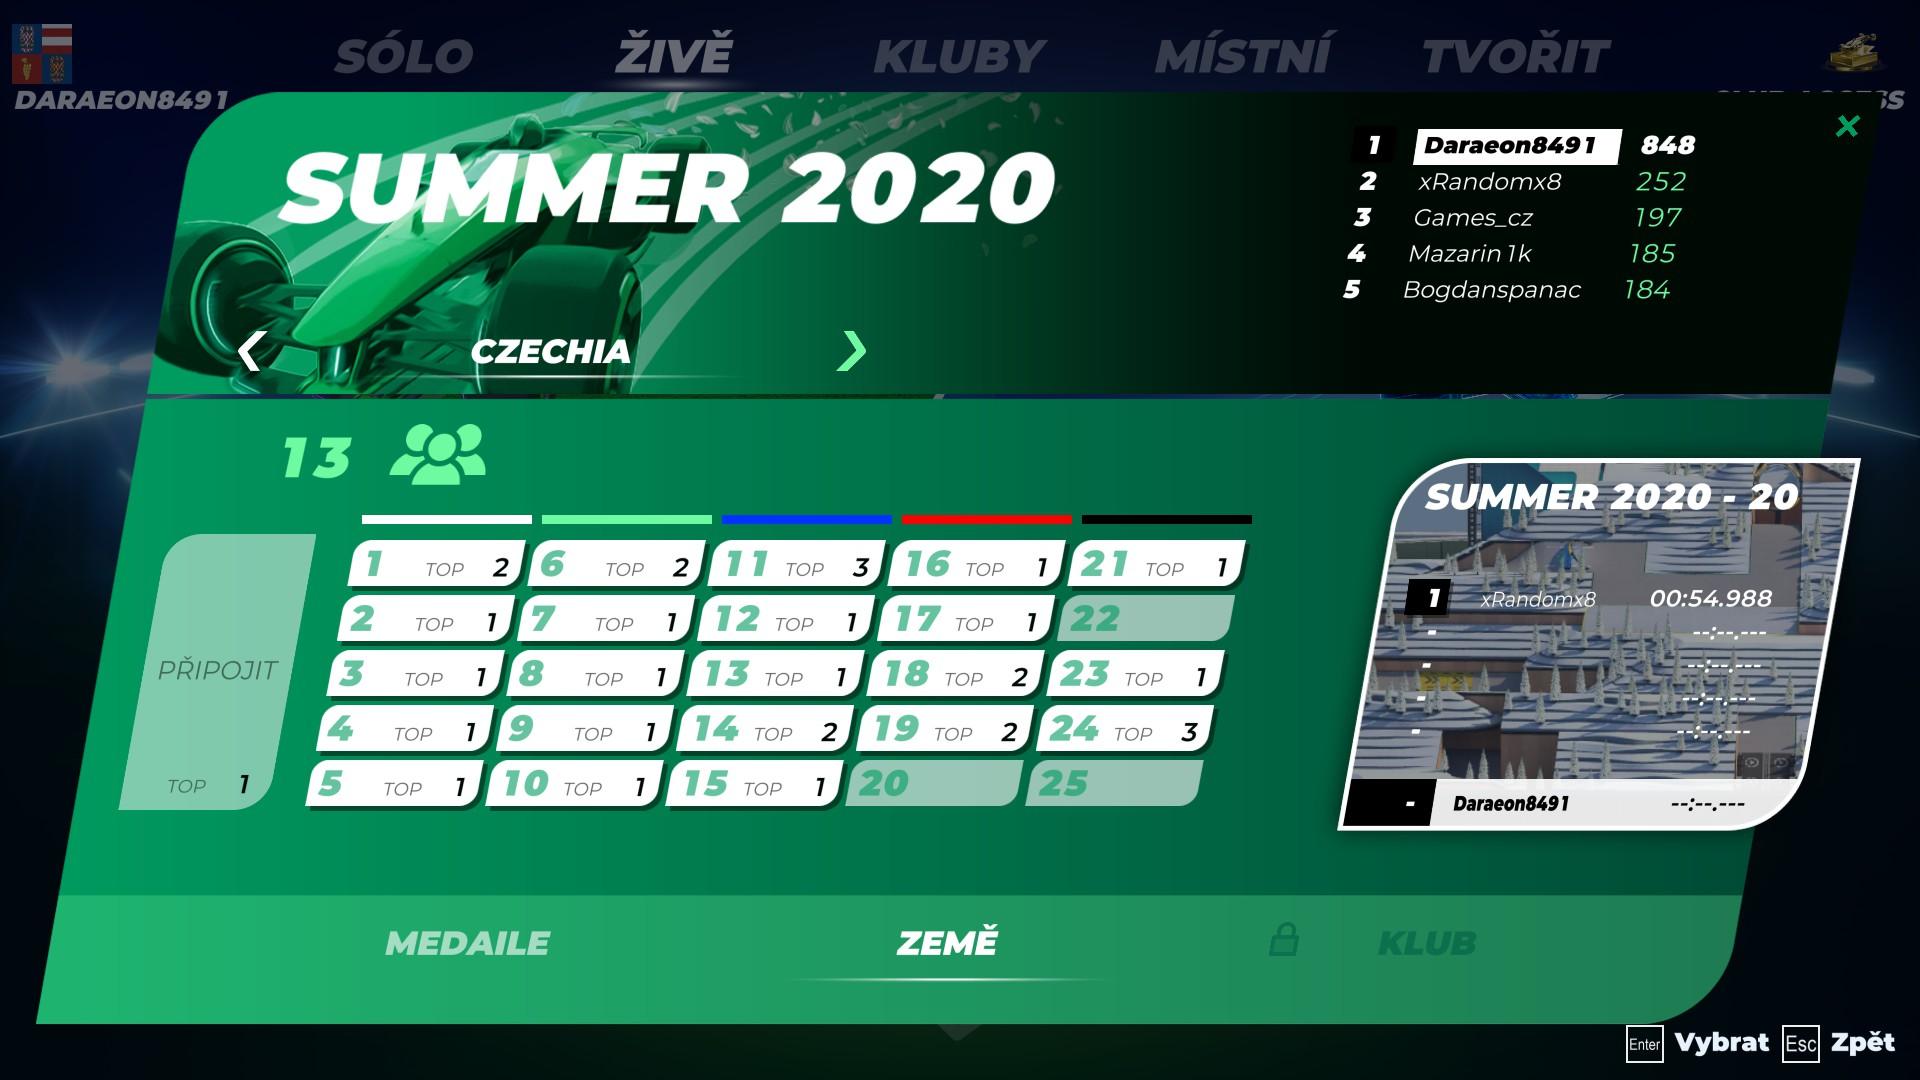 Recenze: Trackmania Trackmania2020 6 26 23 0 24